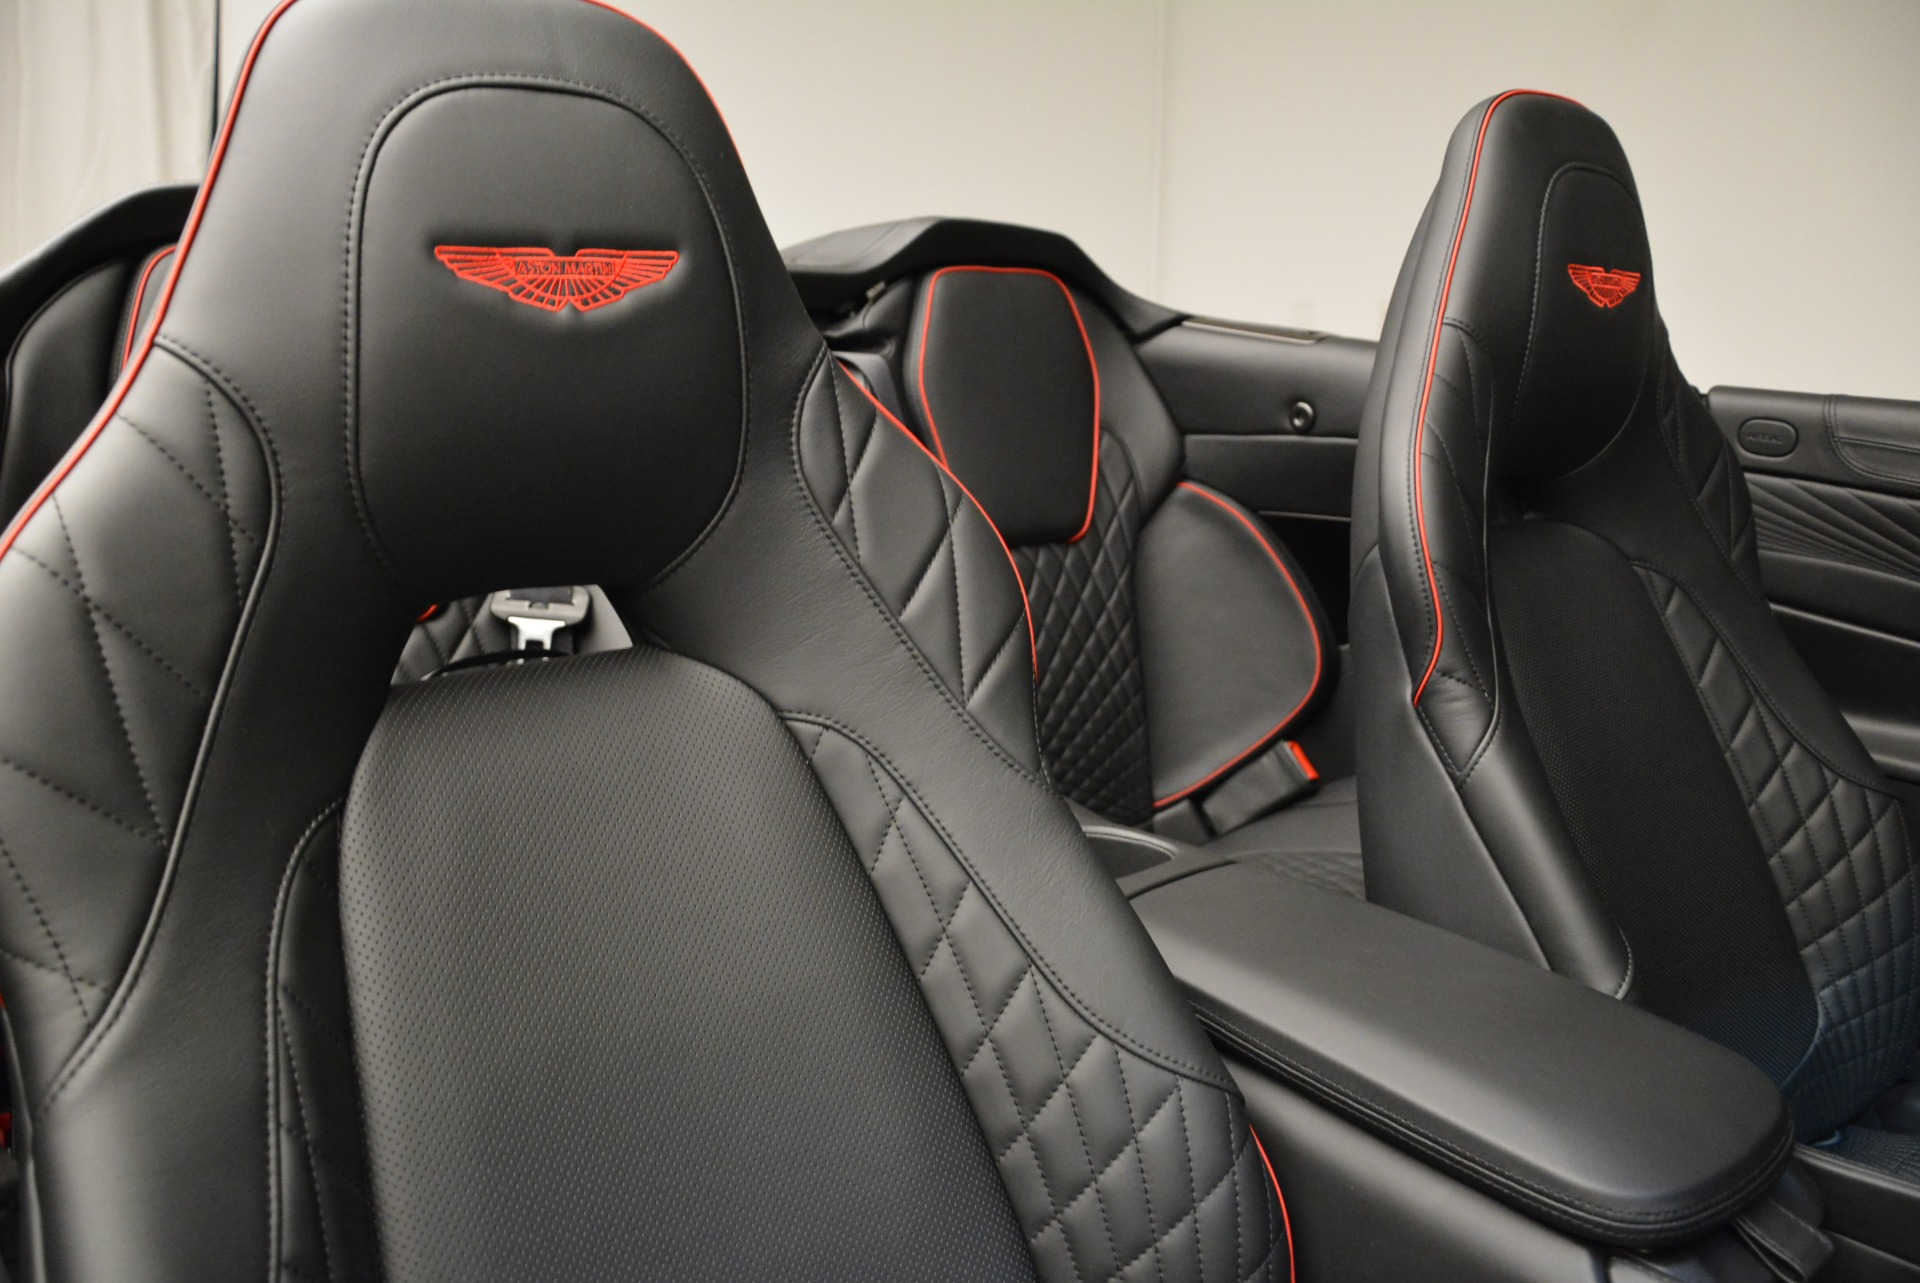 Used 2018 Aston Martin Vanquish S Convertible For Sale In Westport, CT 1895_p25